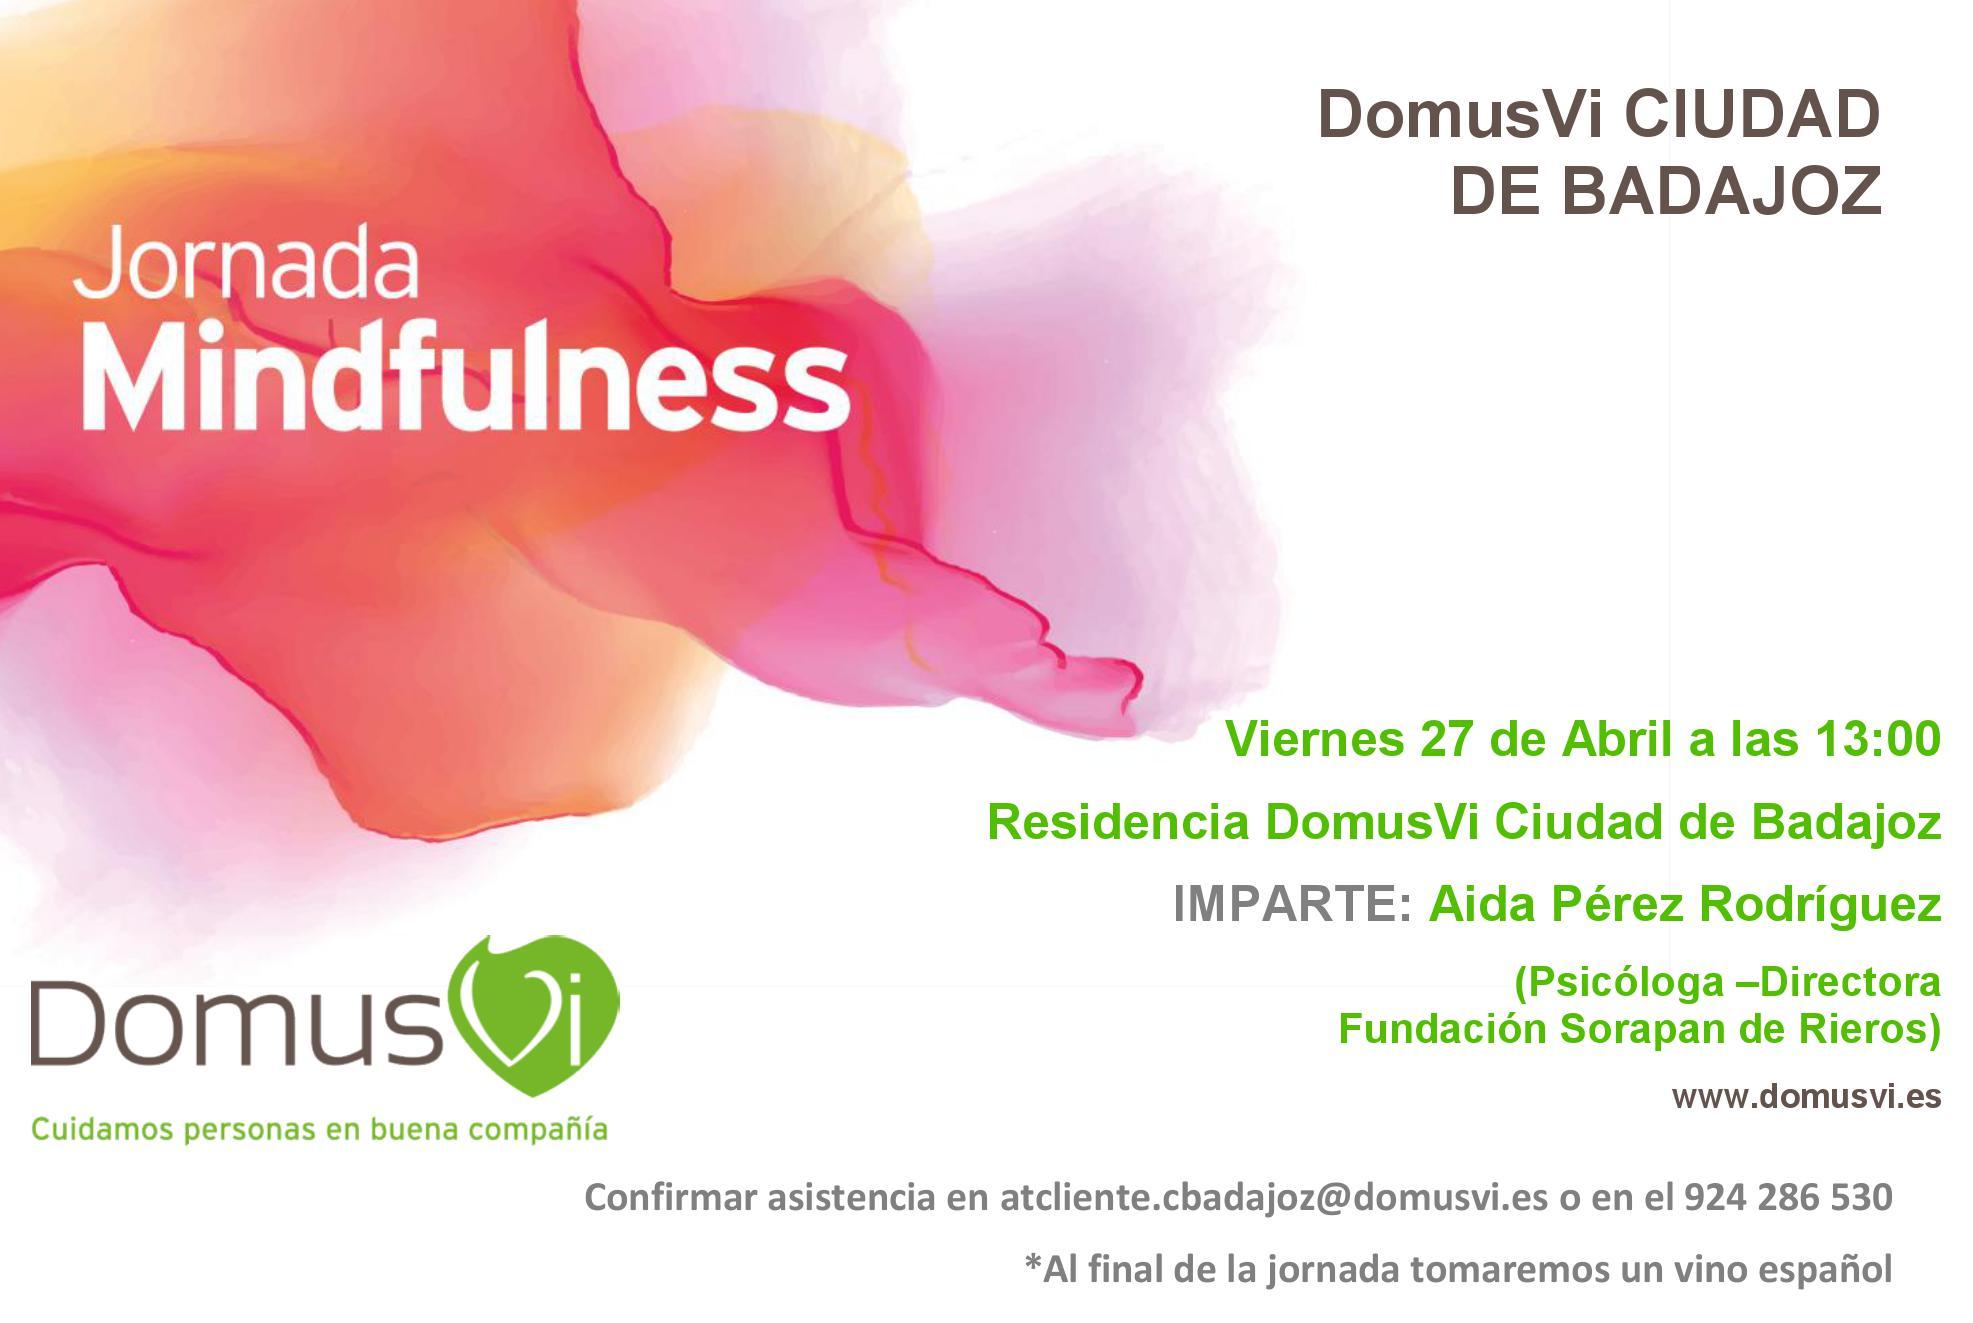 Invitación Jornada Mindfulness DomusVi Badajoz